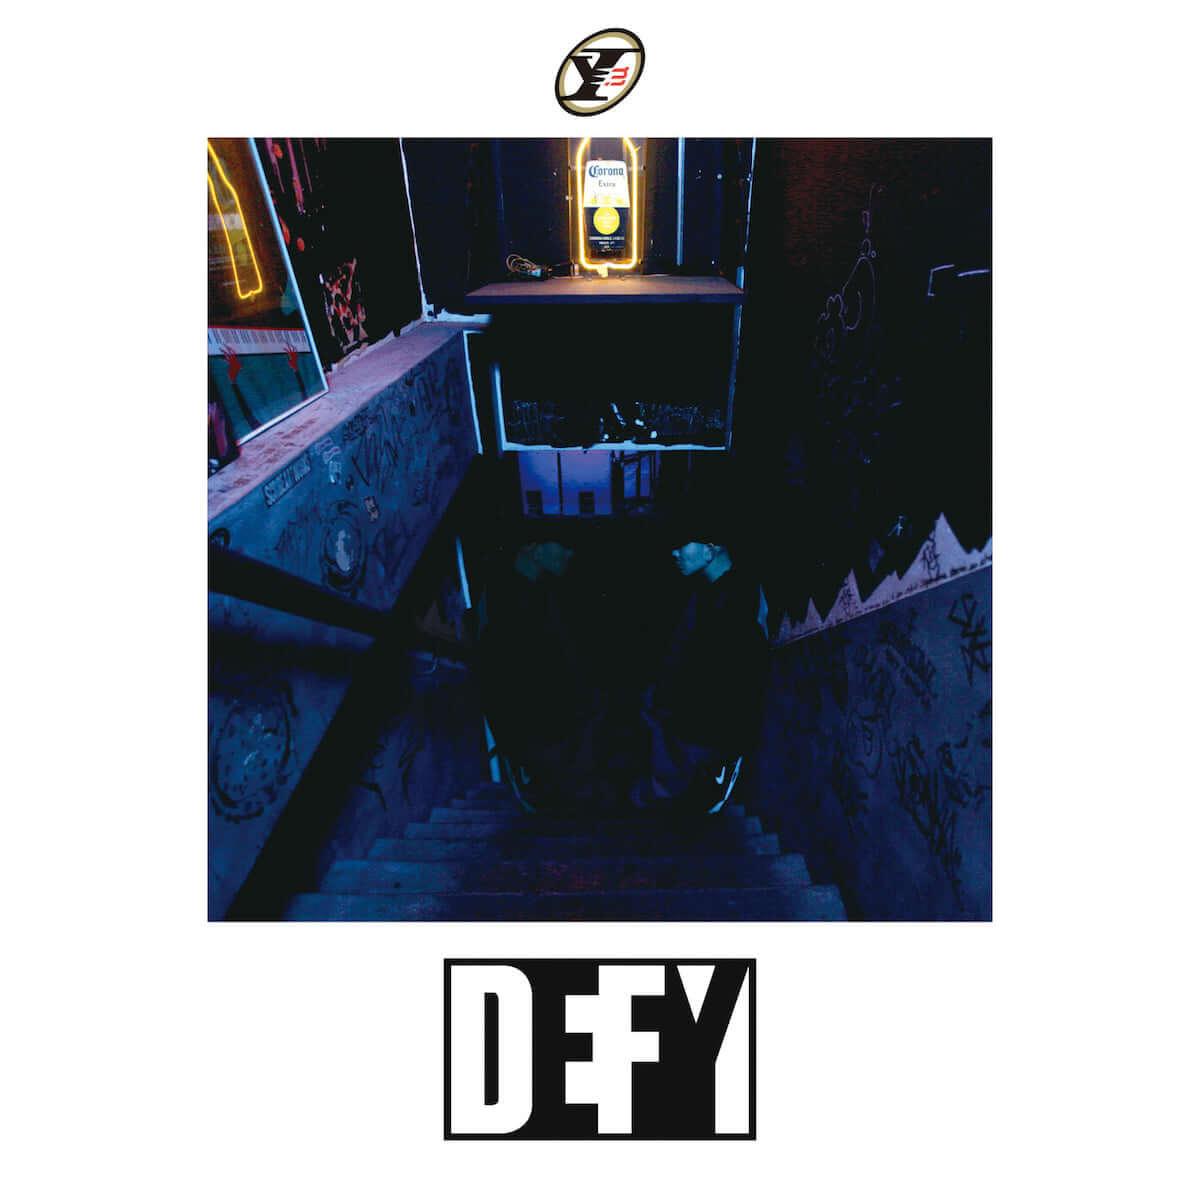 YUKSTA-ILLの最新作『DEFY』よりOMSBプロデュース楽曲「SELFISH」のMVが公開 music190318-yustaill-1-1200x1186